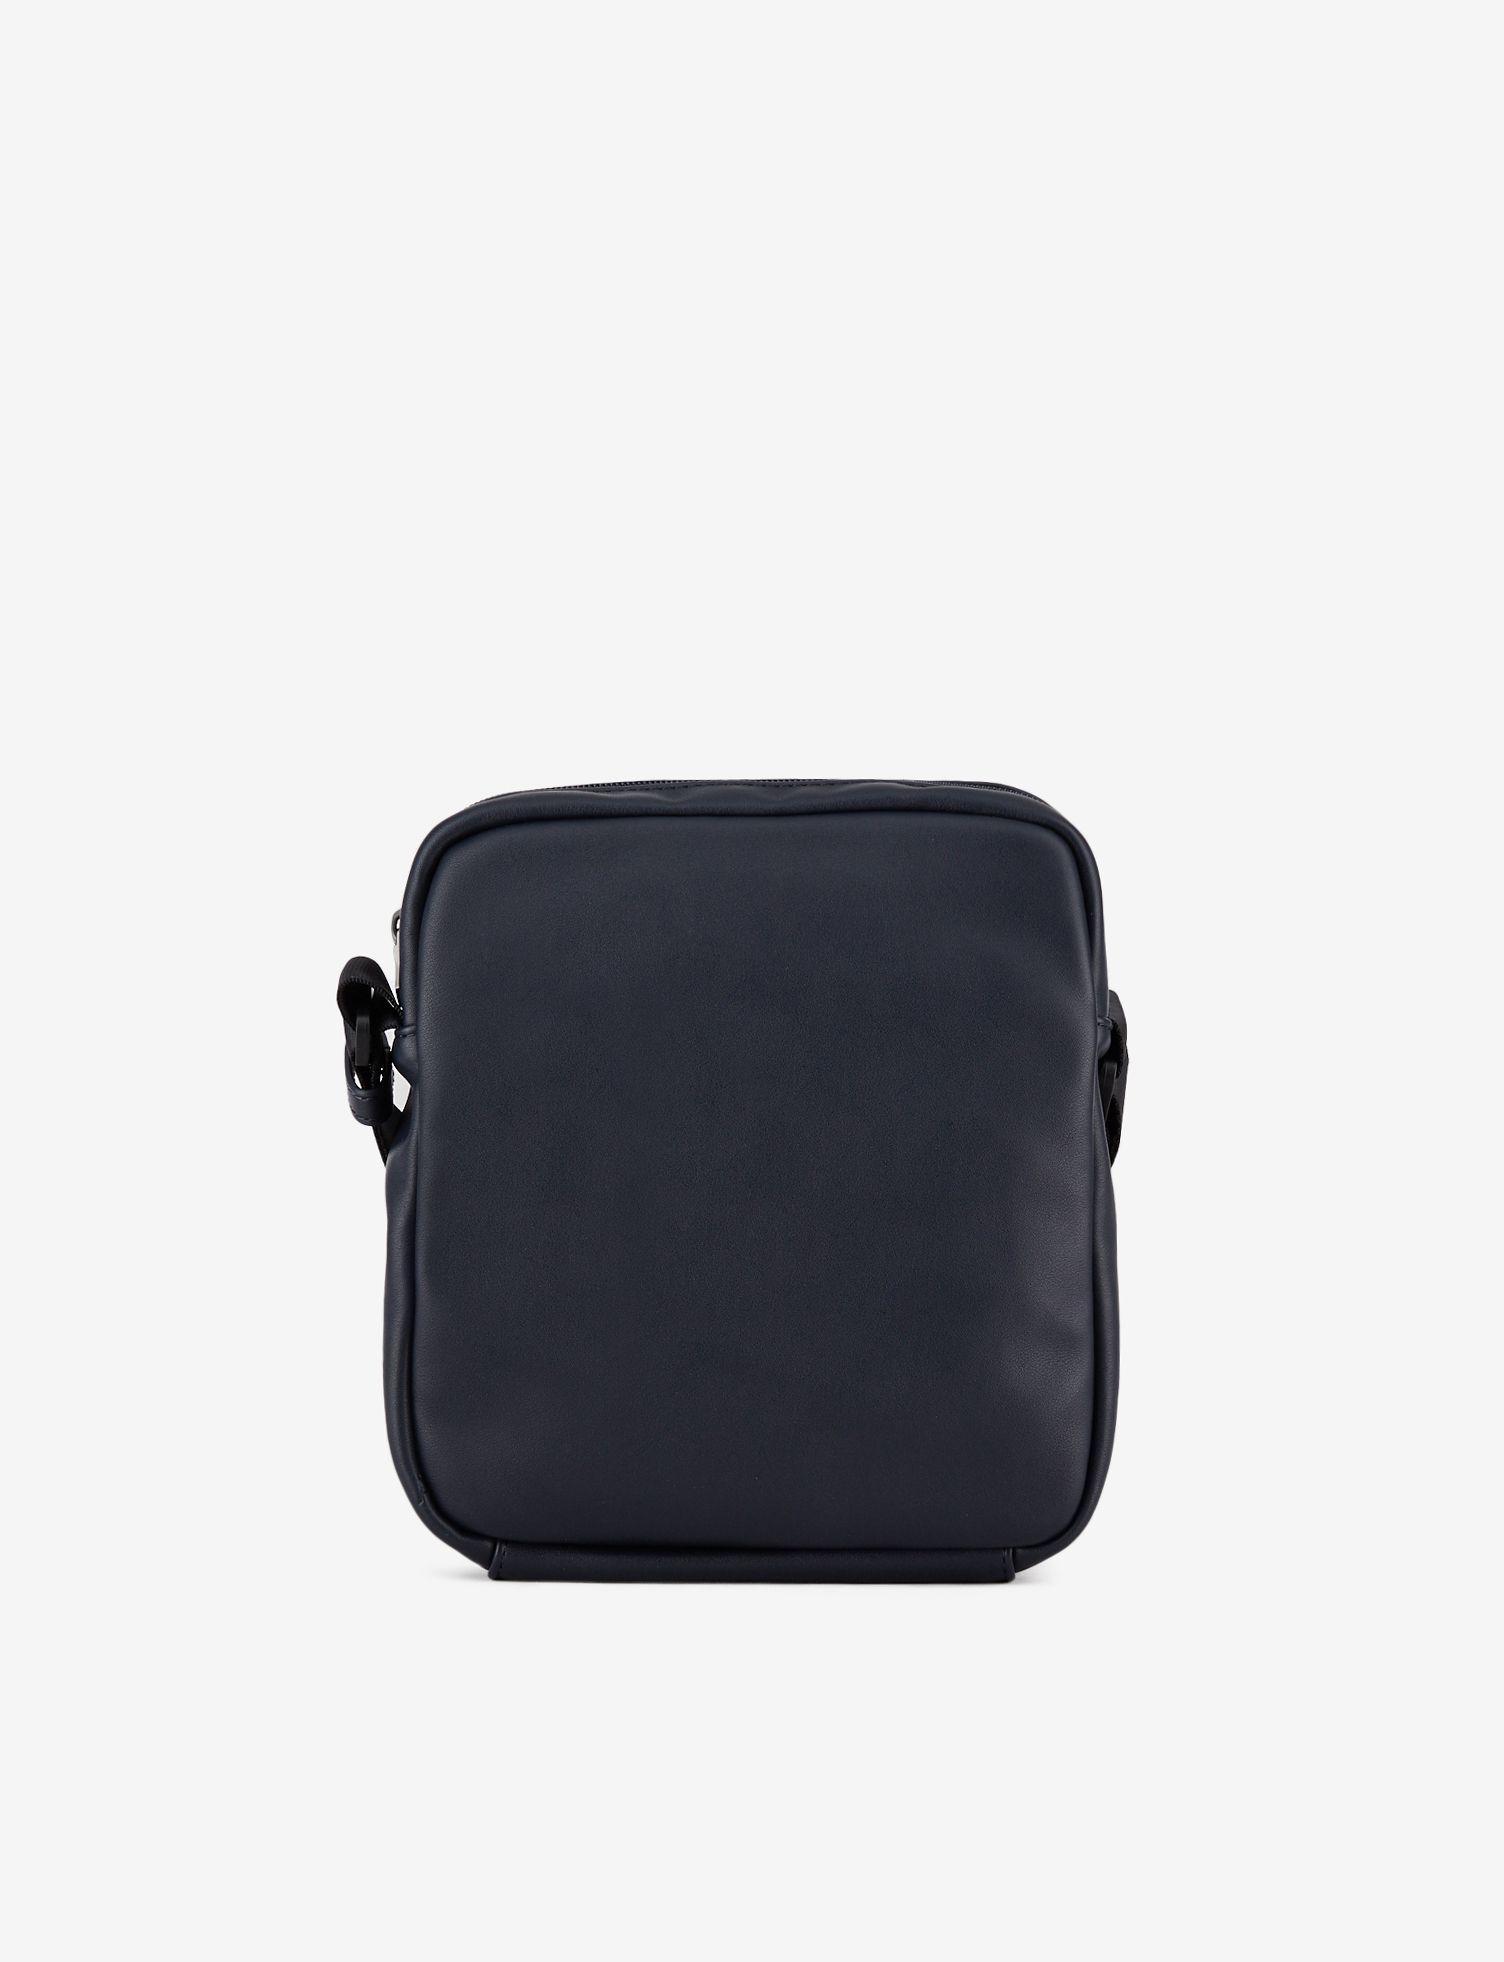 972306defa3 Men's Blue Fabric Shoulder Bag